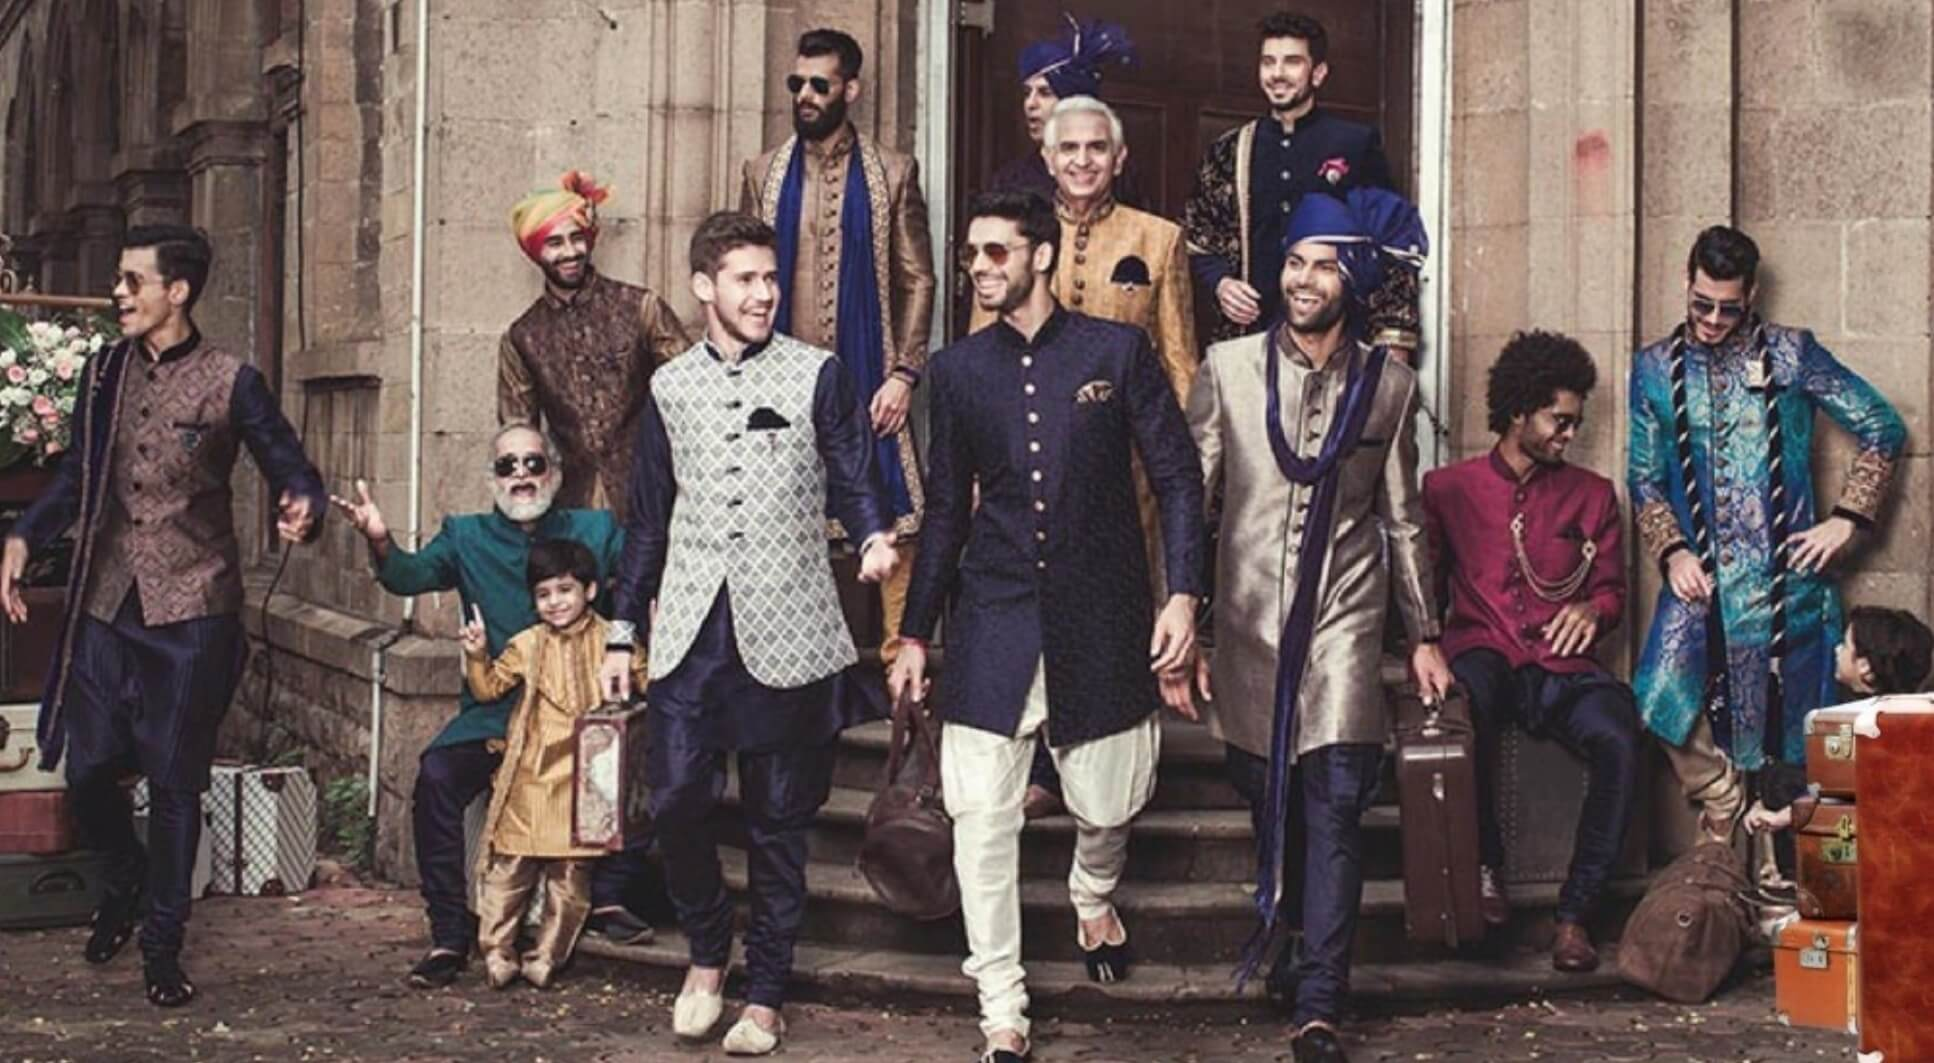 Men's Ethnic Wear: Why Should Girls Wear all Things Nice